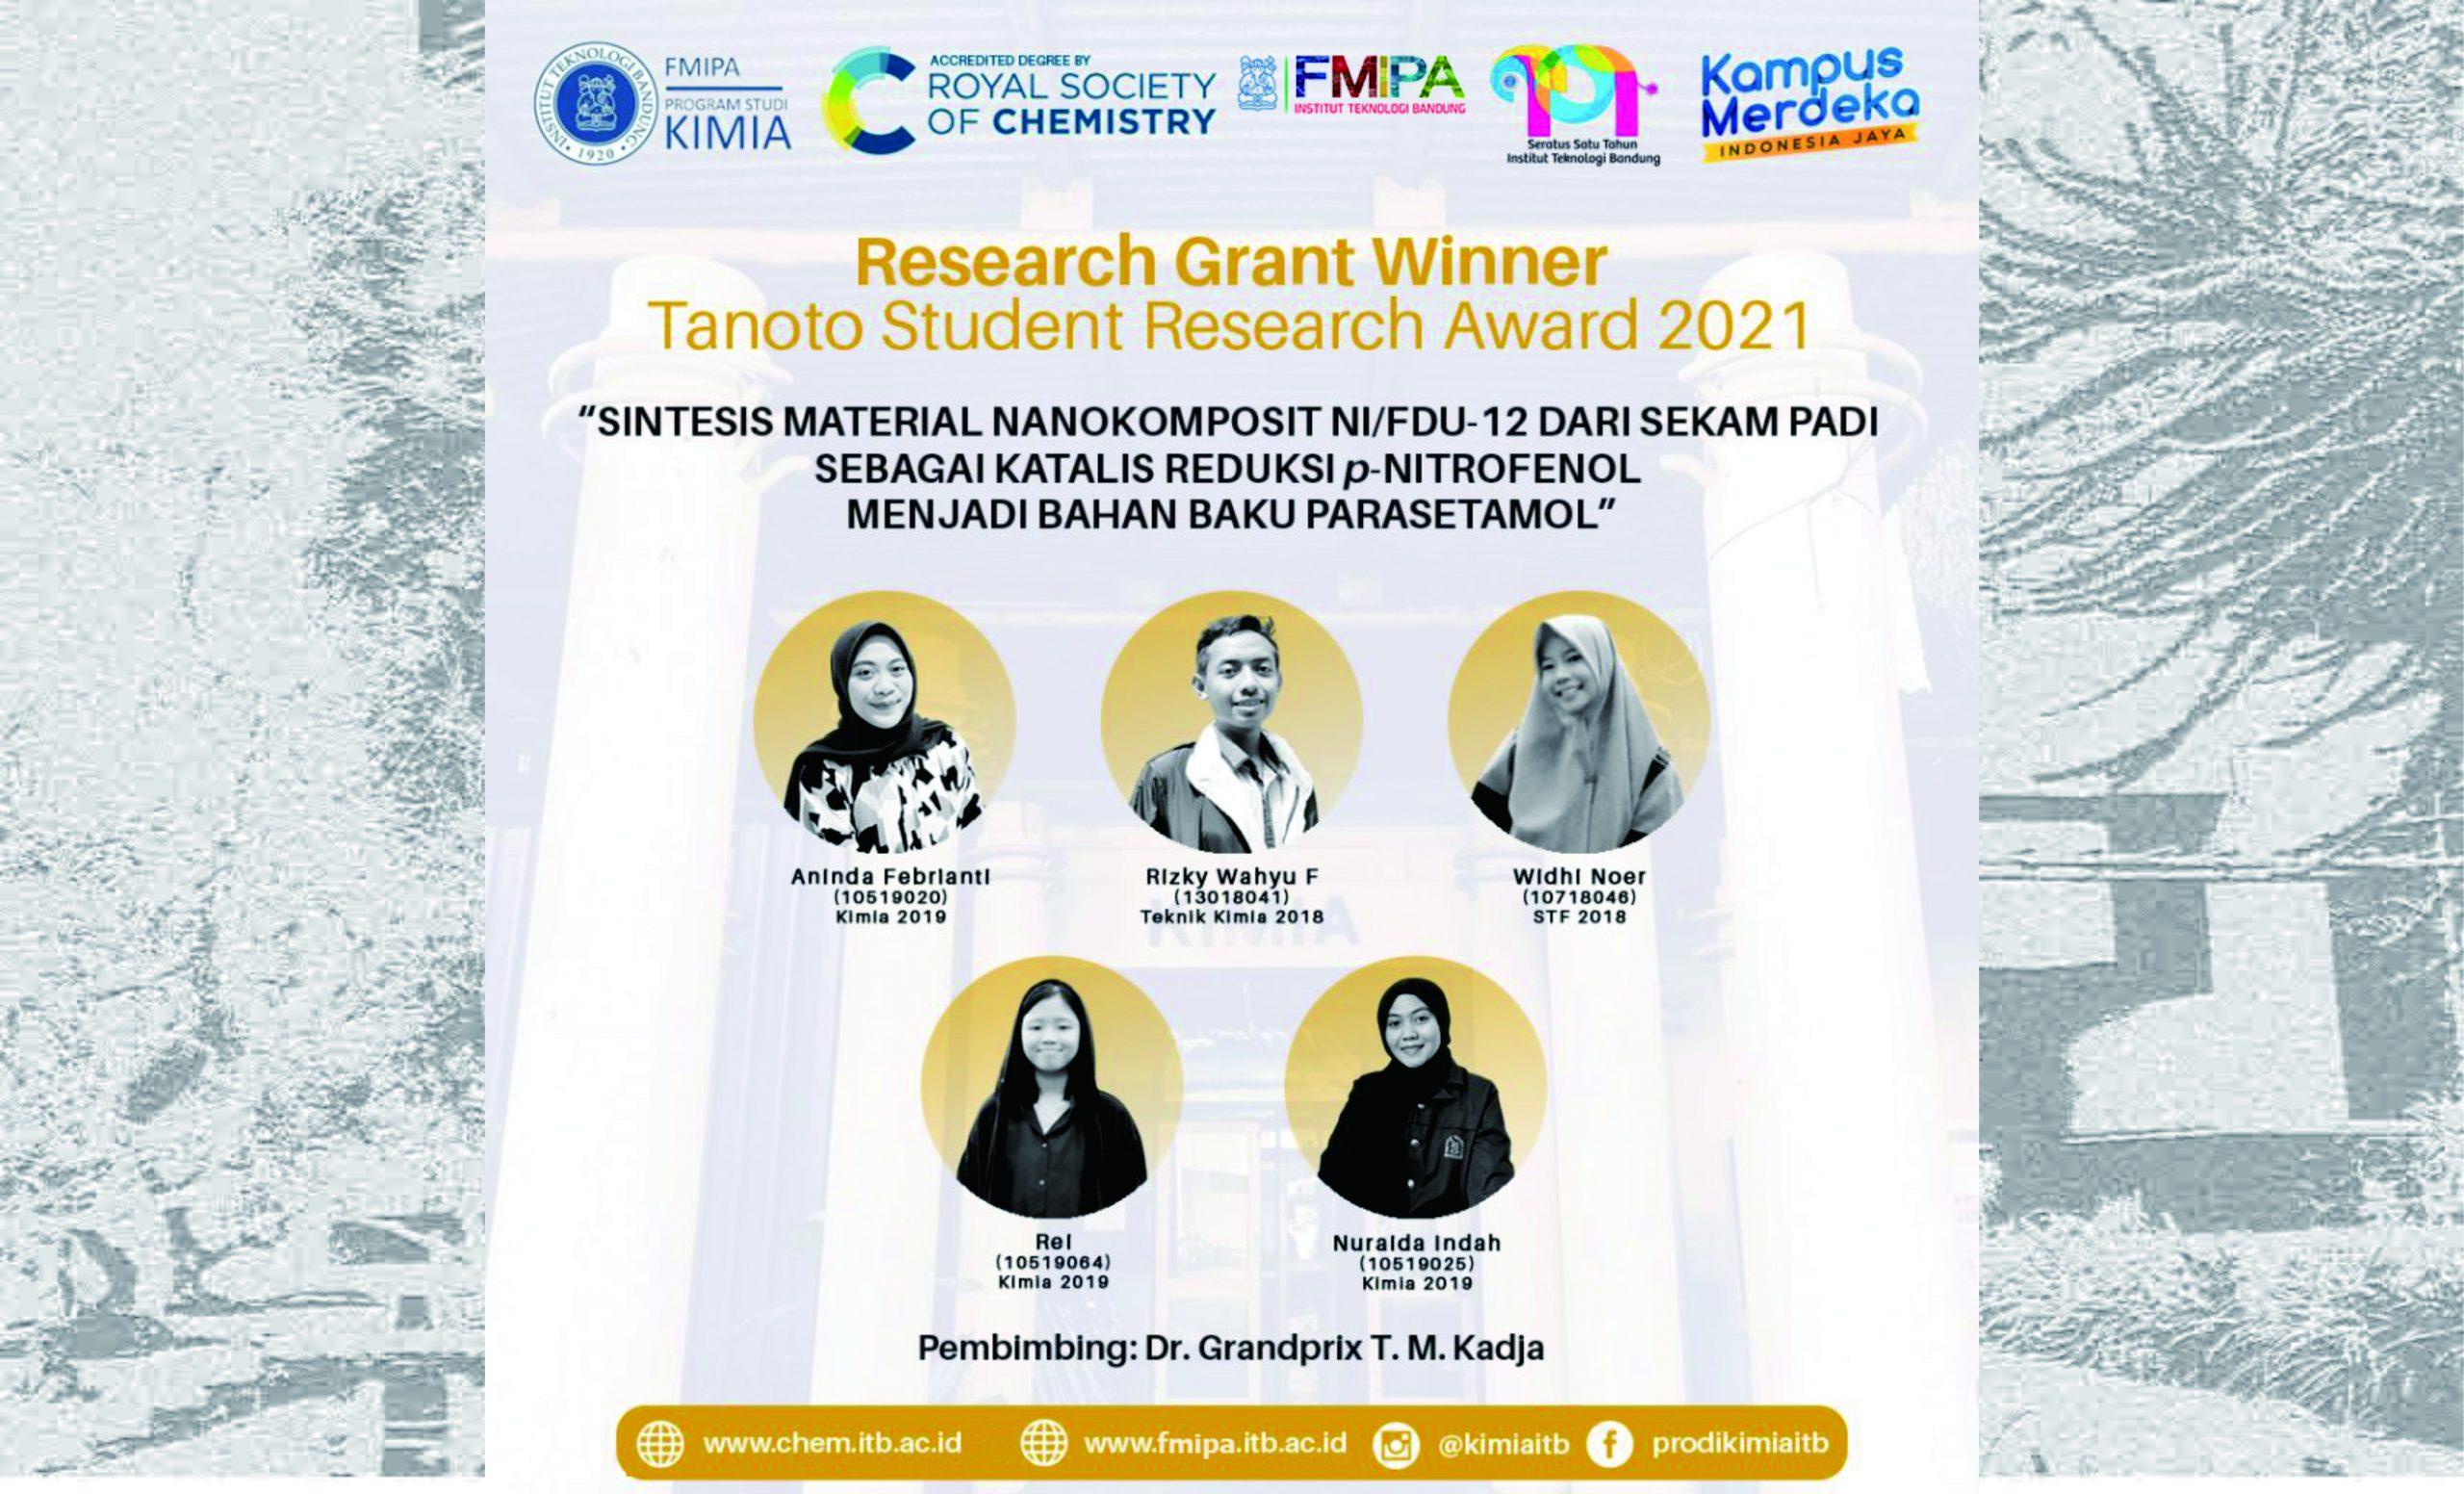 Tanoto Student Research Award 2021